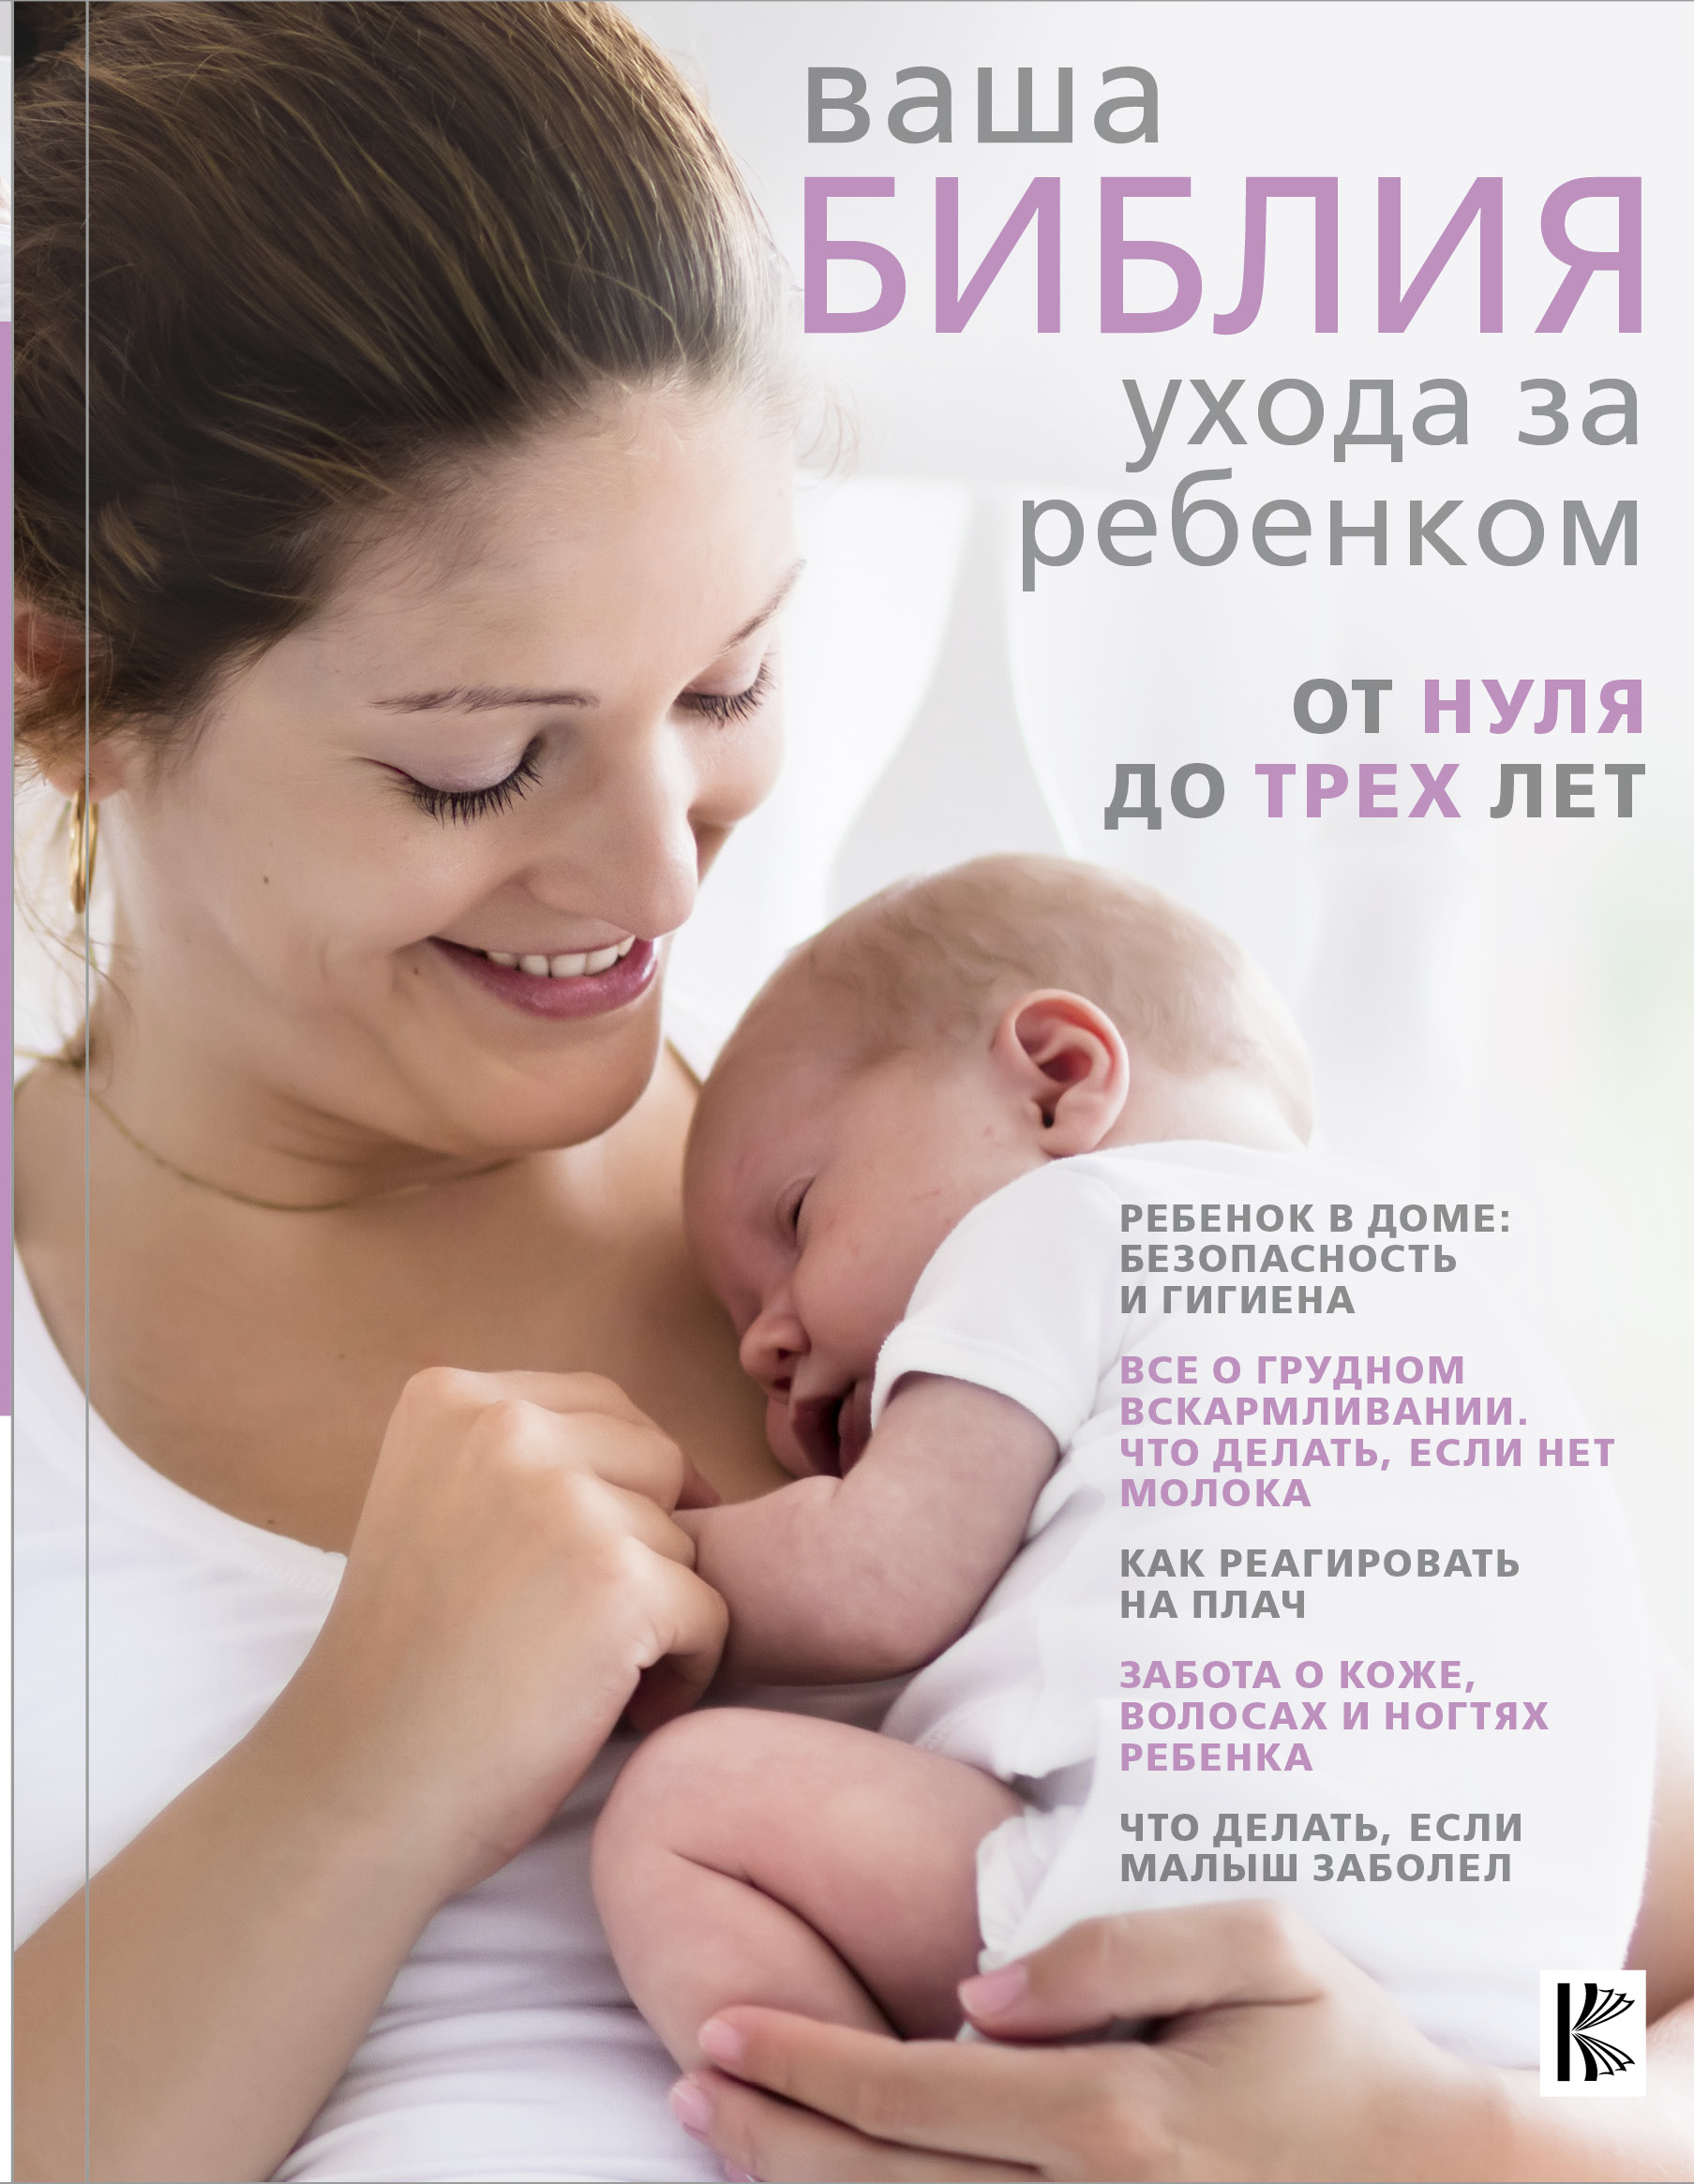 Уотерстон Тони Ваша библия ухода за ребенком. От 0 до 3 лет отсутствует развитие ребенка и уход за ним от рождения до трех лет